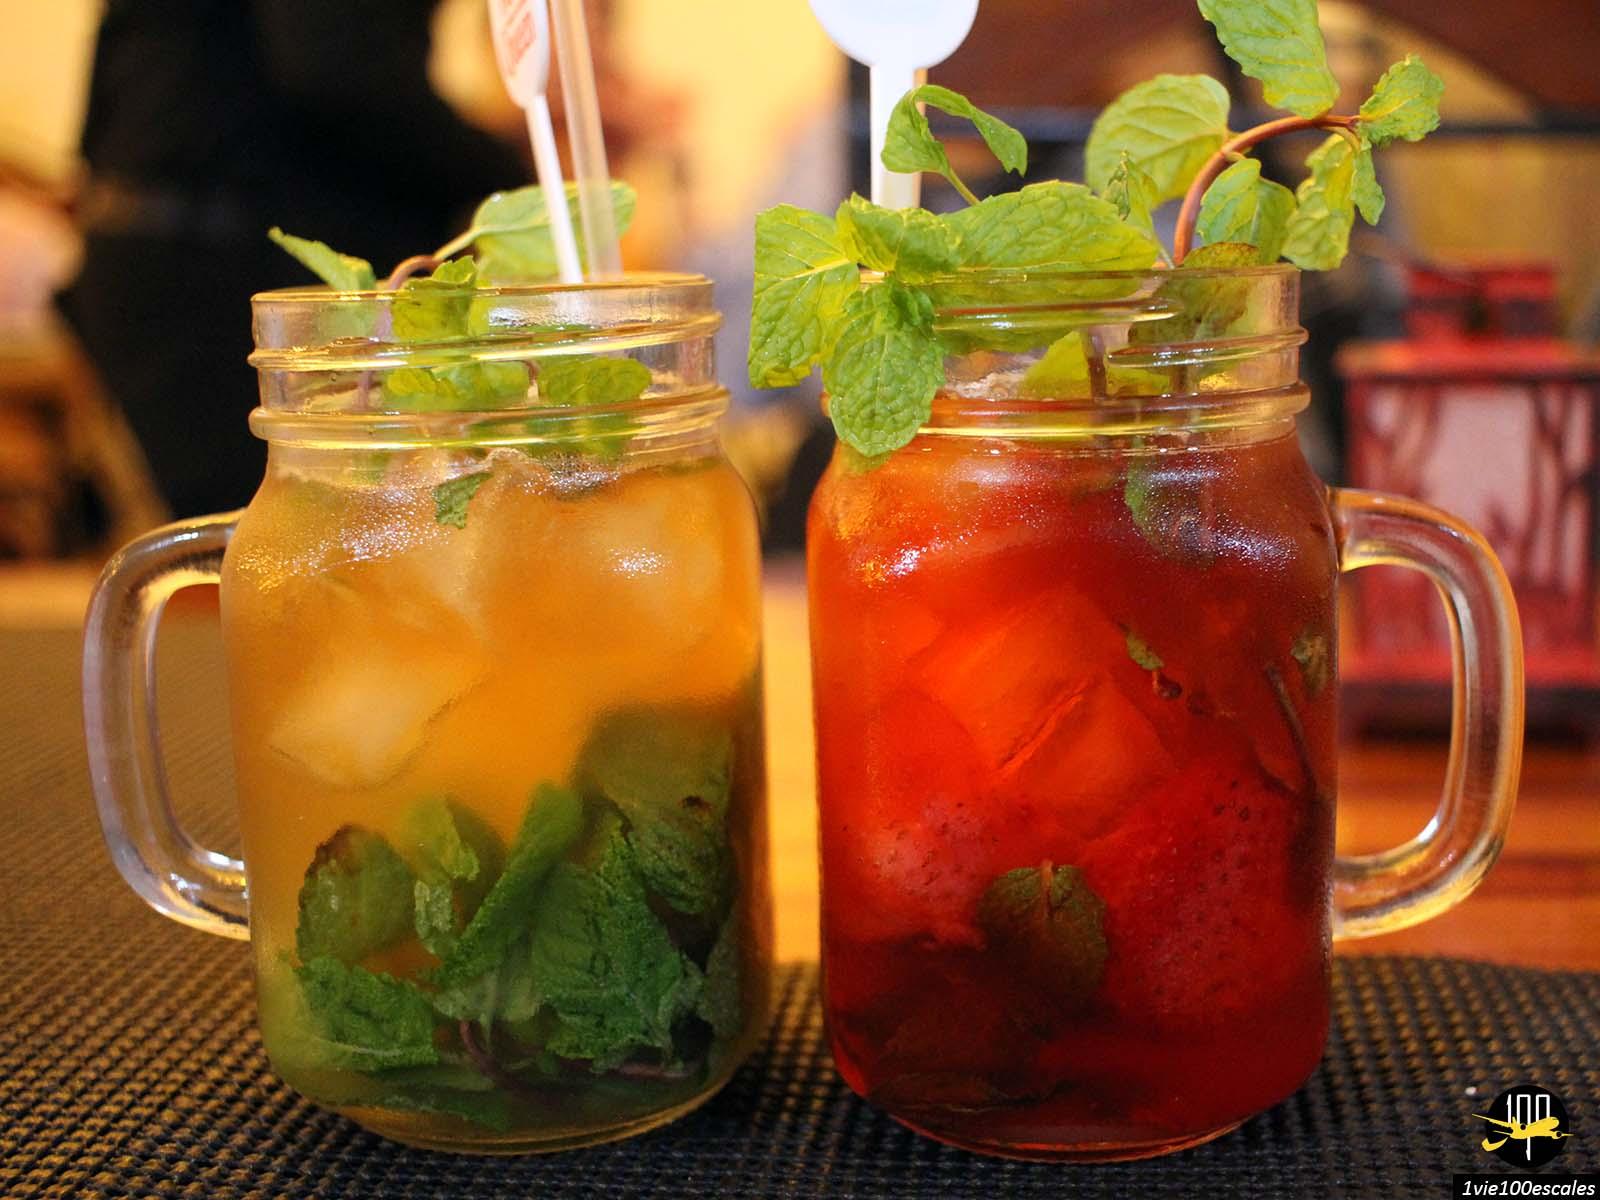 Le mojito la boisson typique de La Havane à Cuba